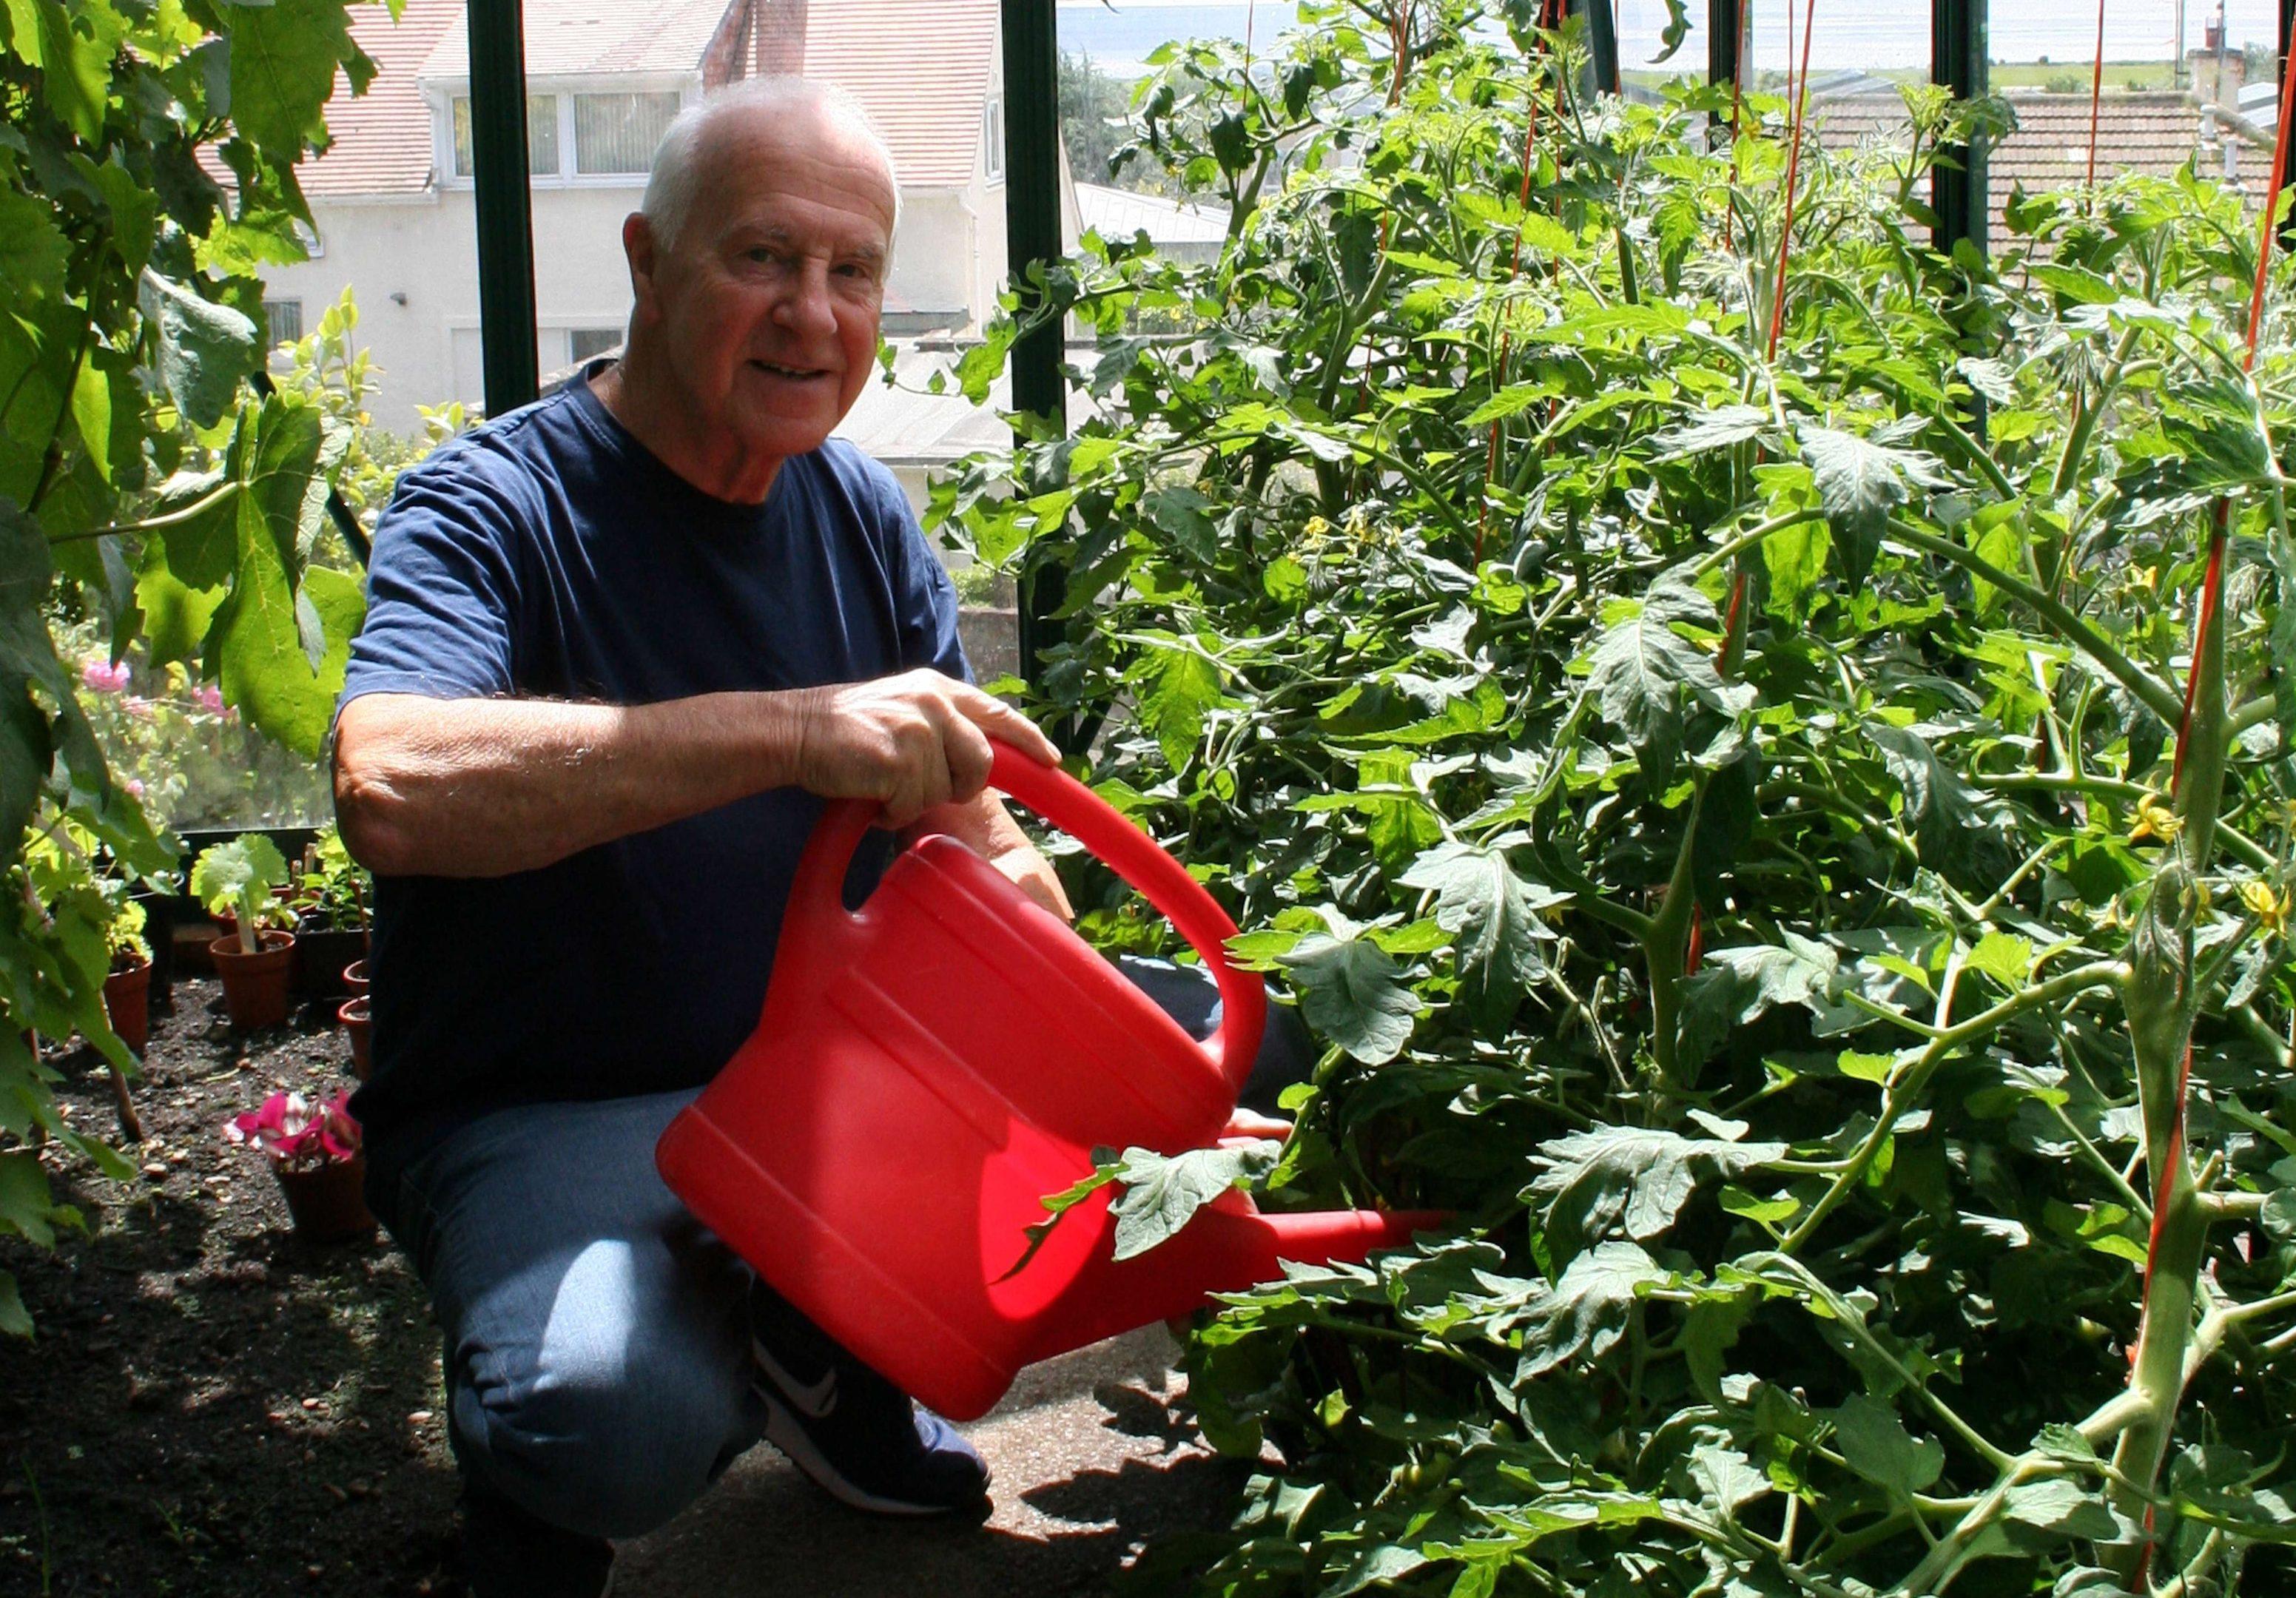 Feeding the tomatoes